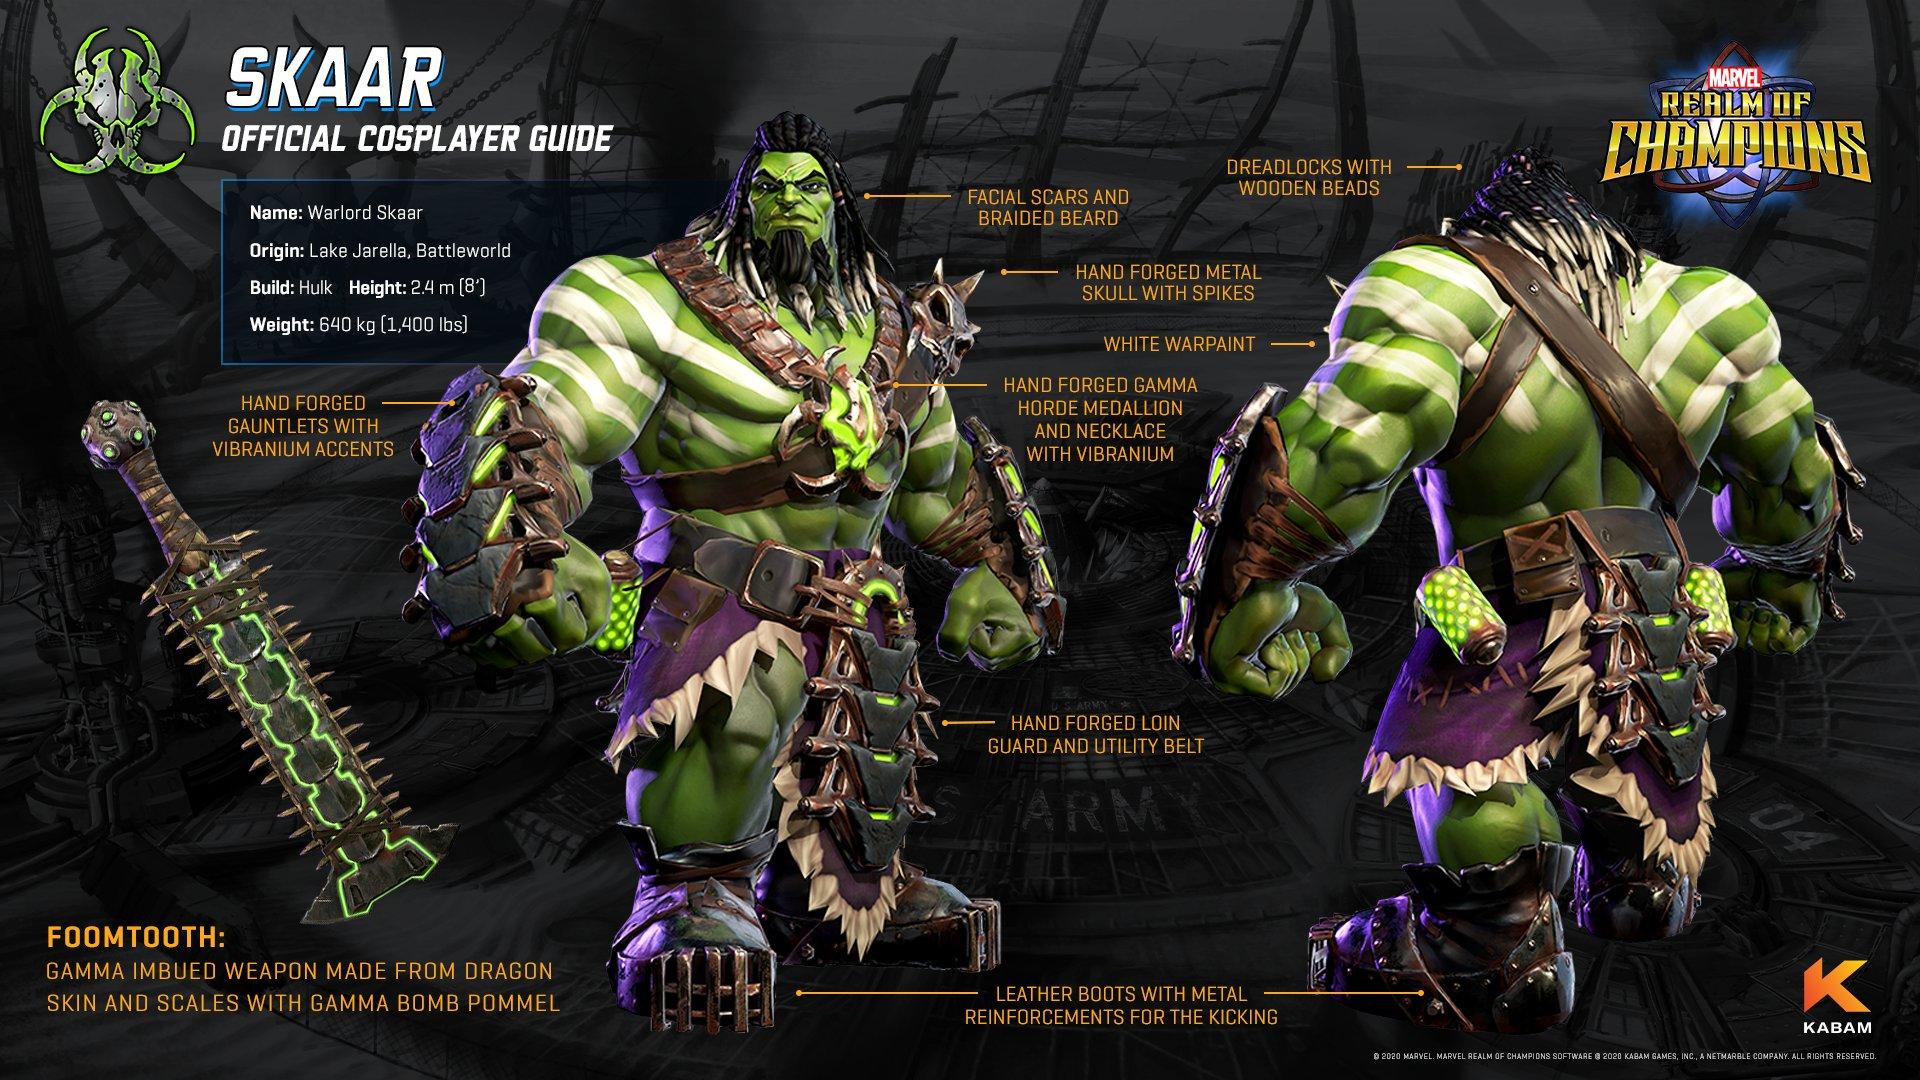 Marvel Realm of Champions War Skaar Official Cosplayer Guide.jpg